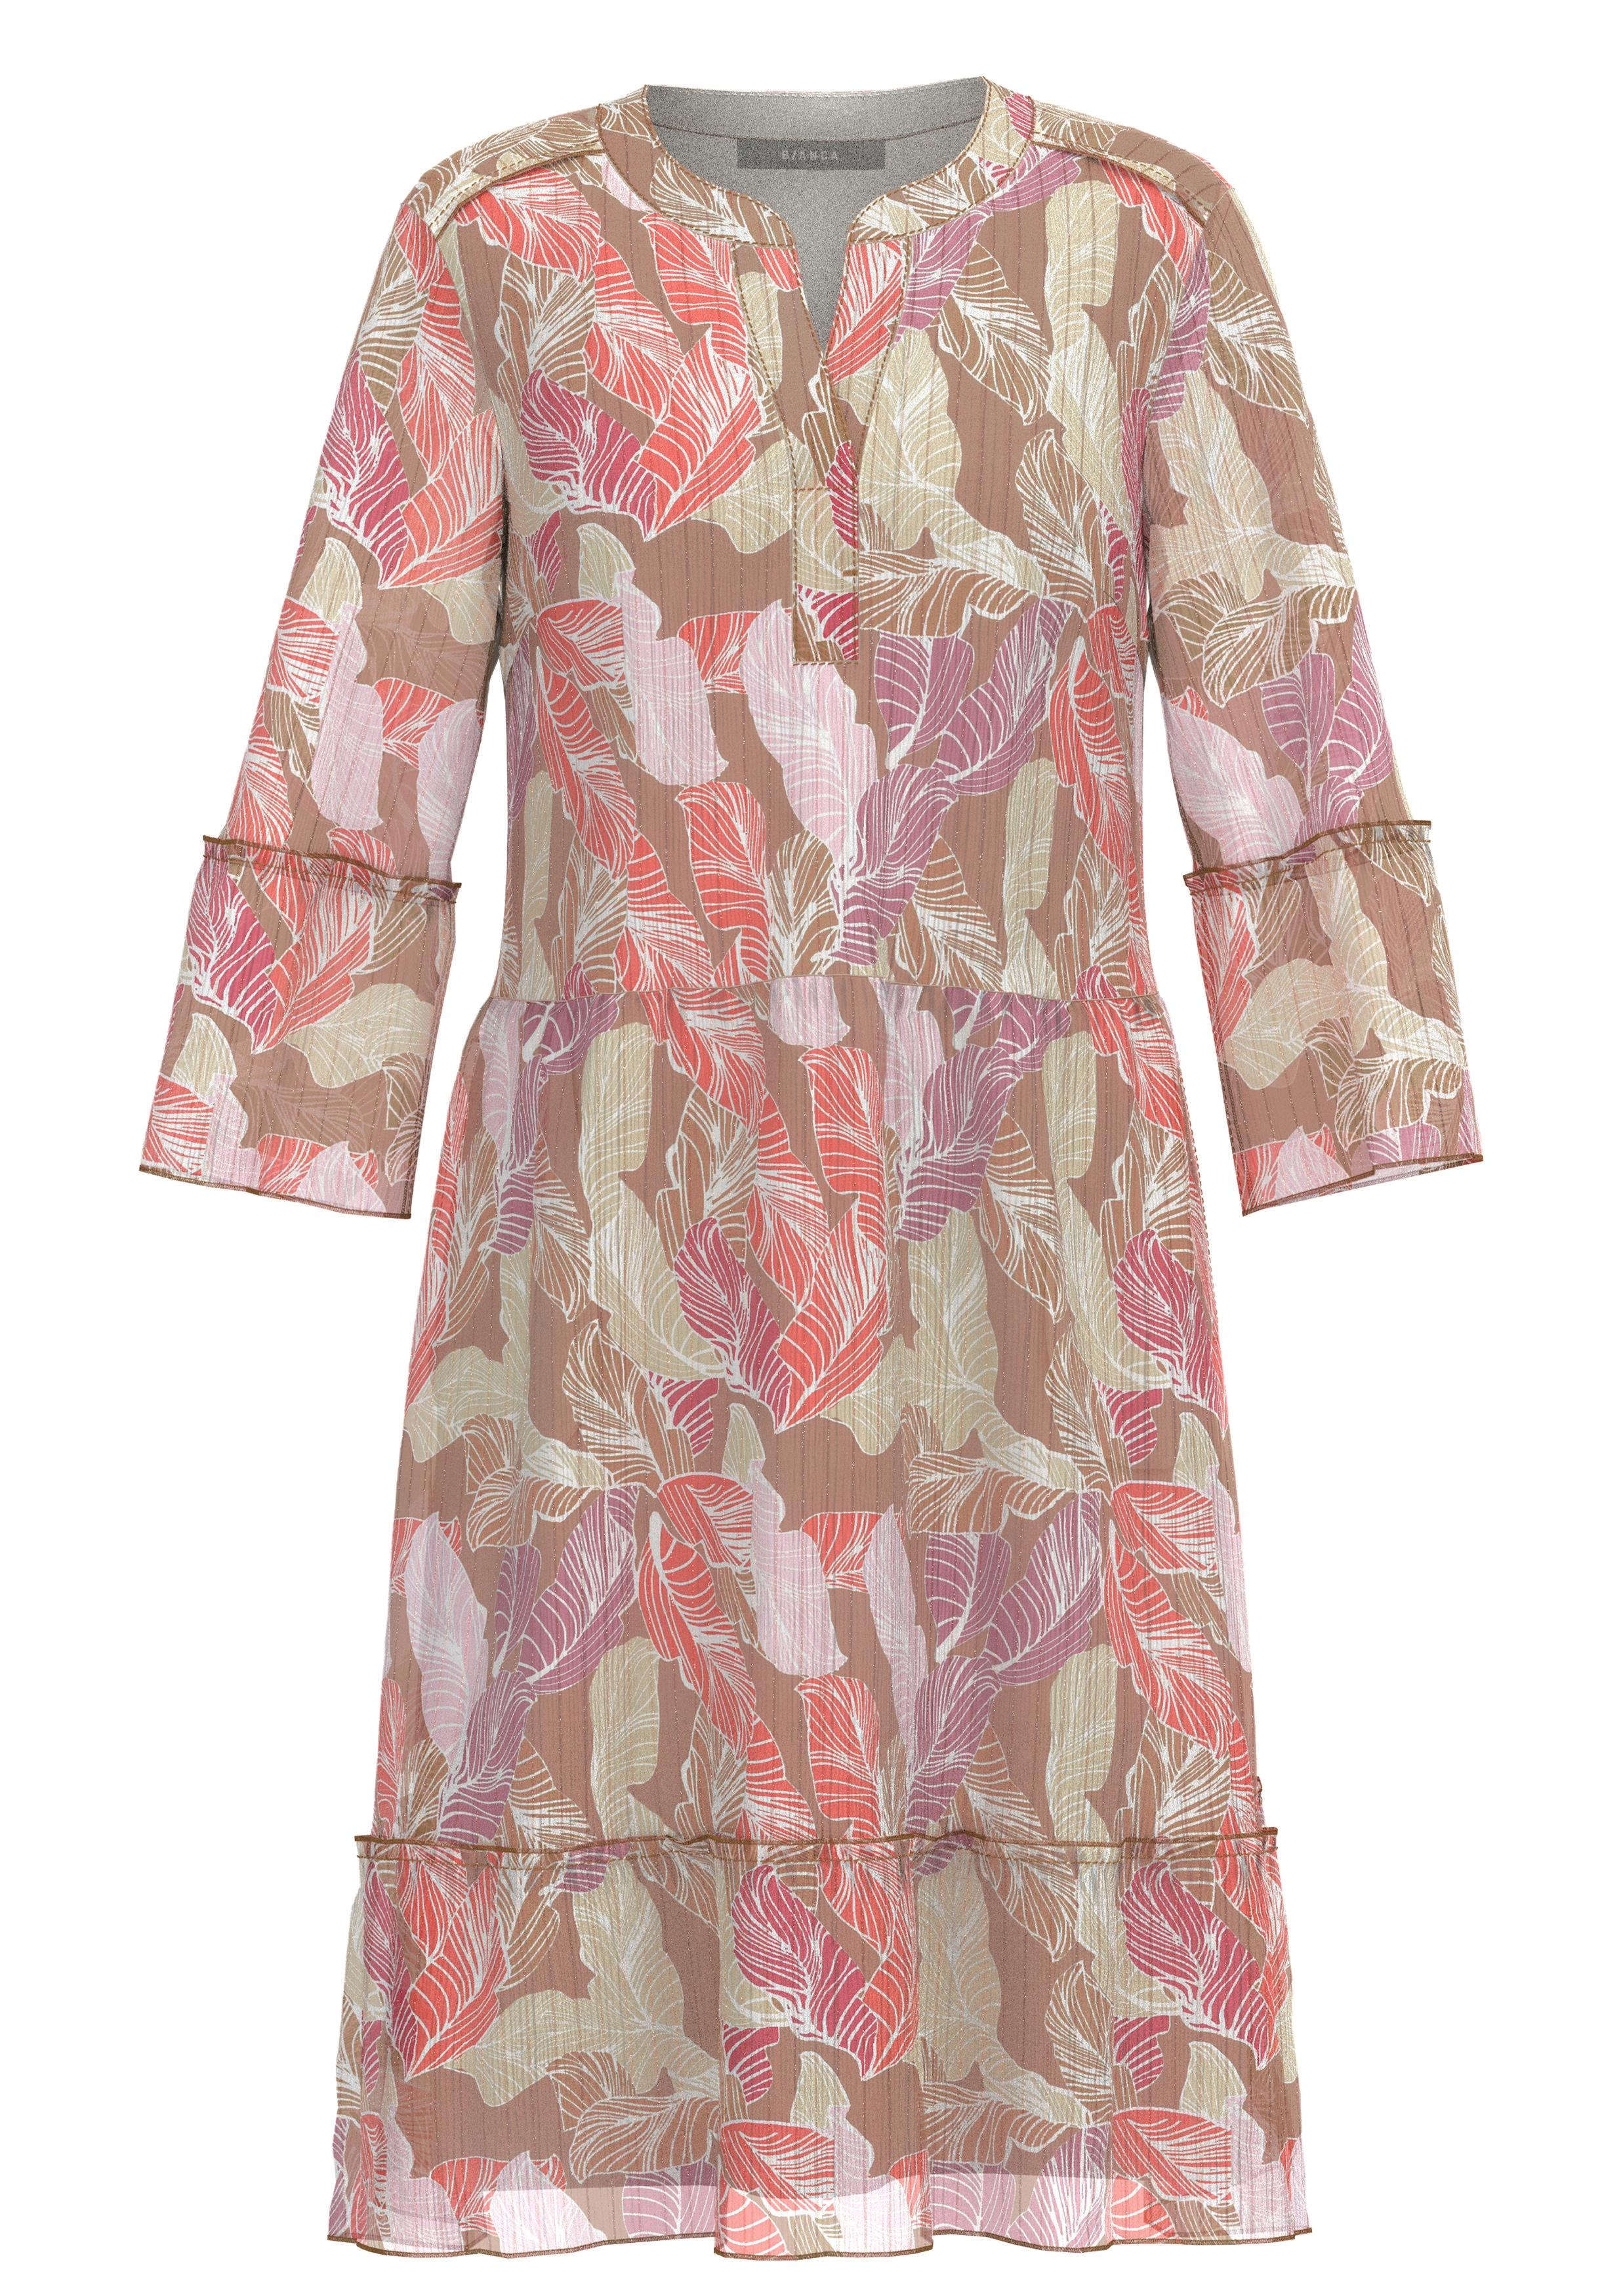 bianca -  Sommerkleid DANY, im coolen Design mit dezenten Glitzerdetails